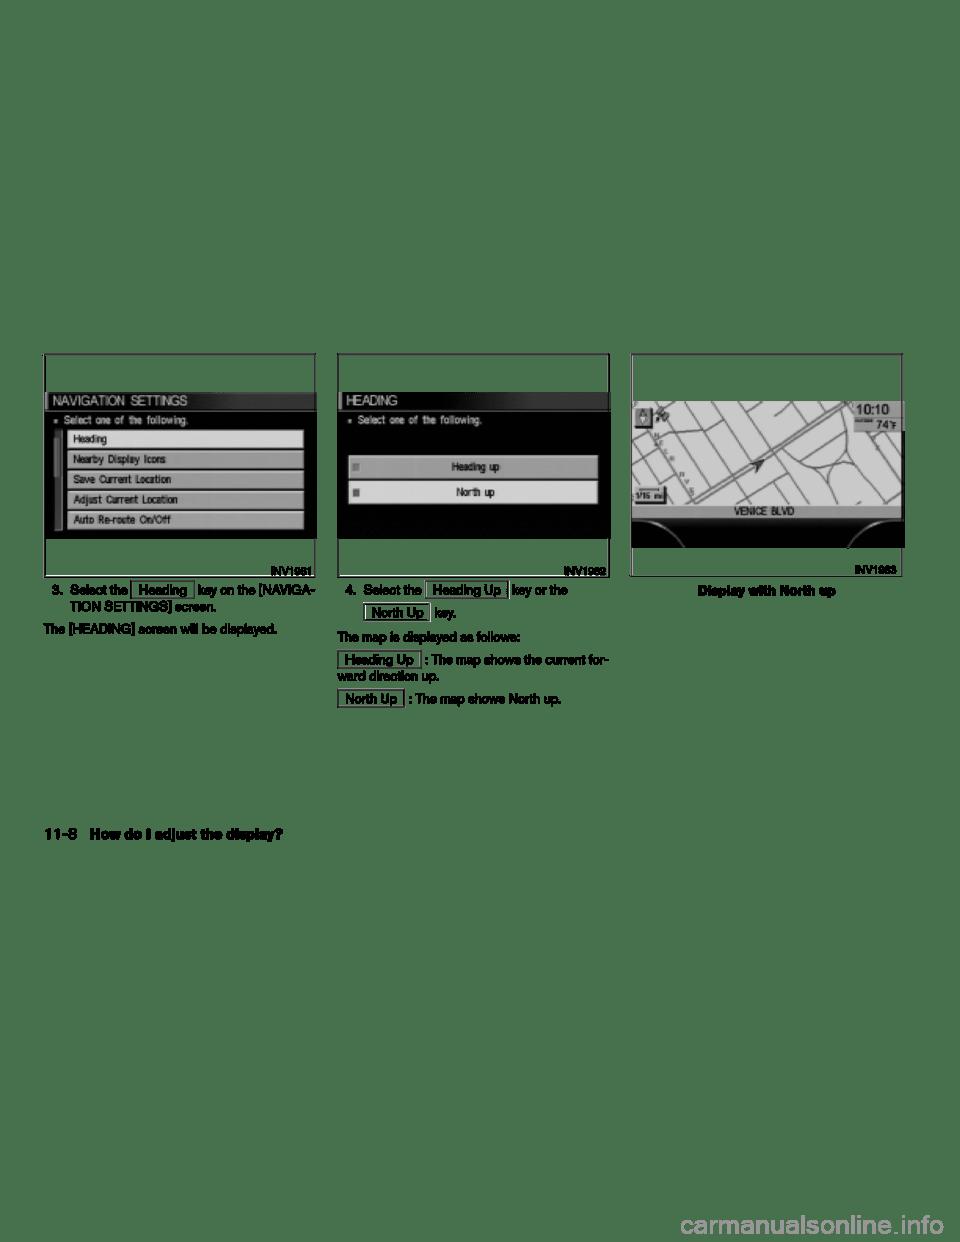 NISSAN MAXIMA 2004 A34 / 6.G Navigation Manual (186 Pages